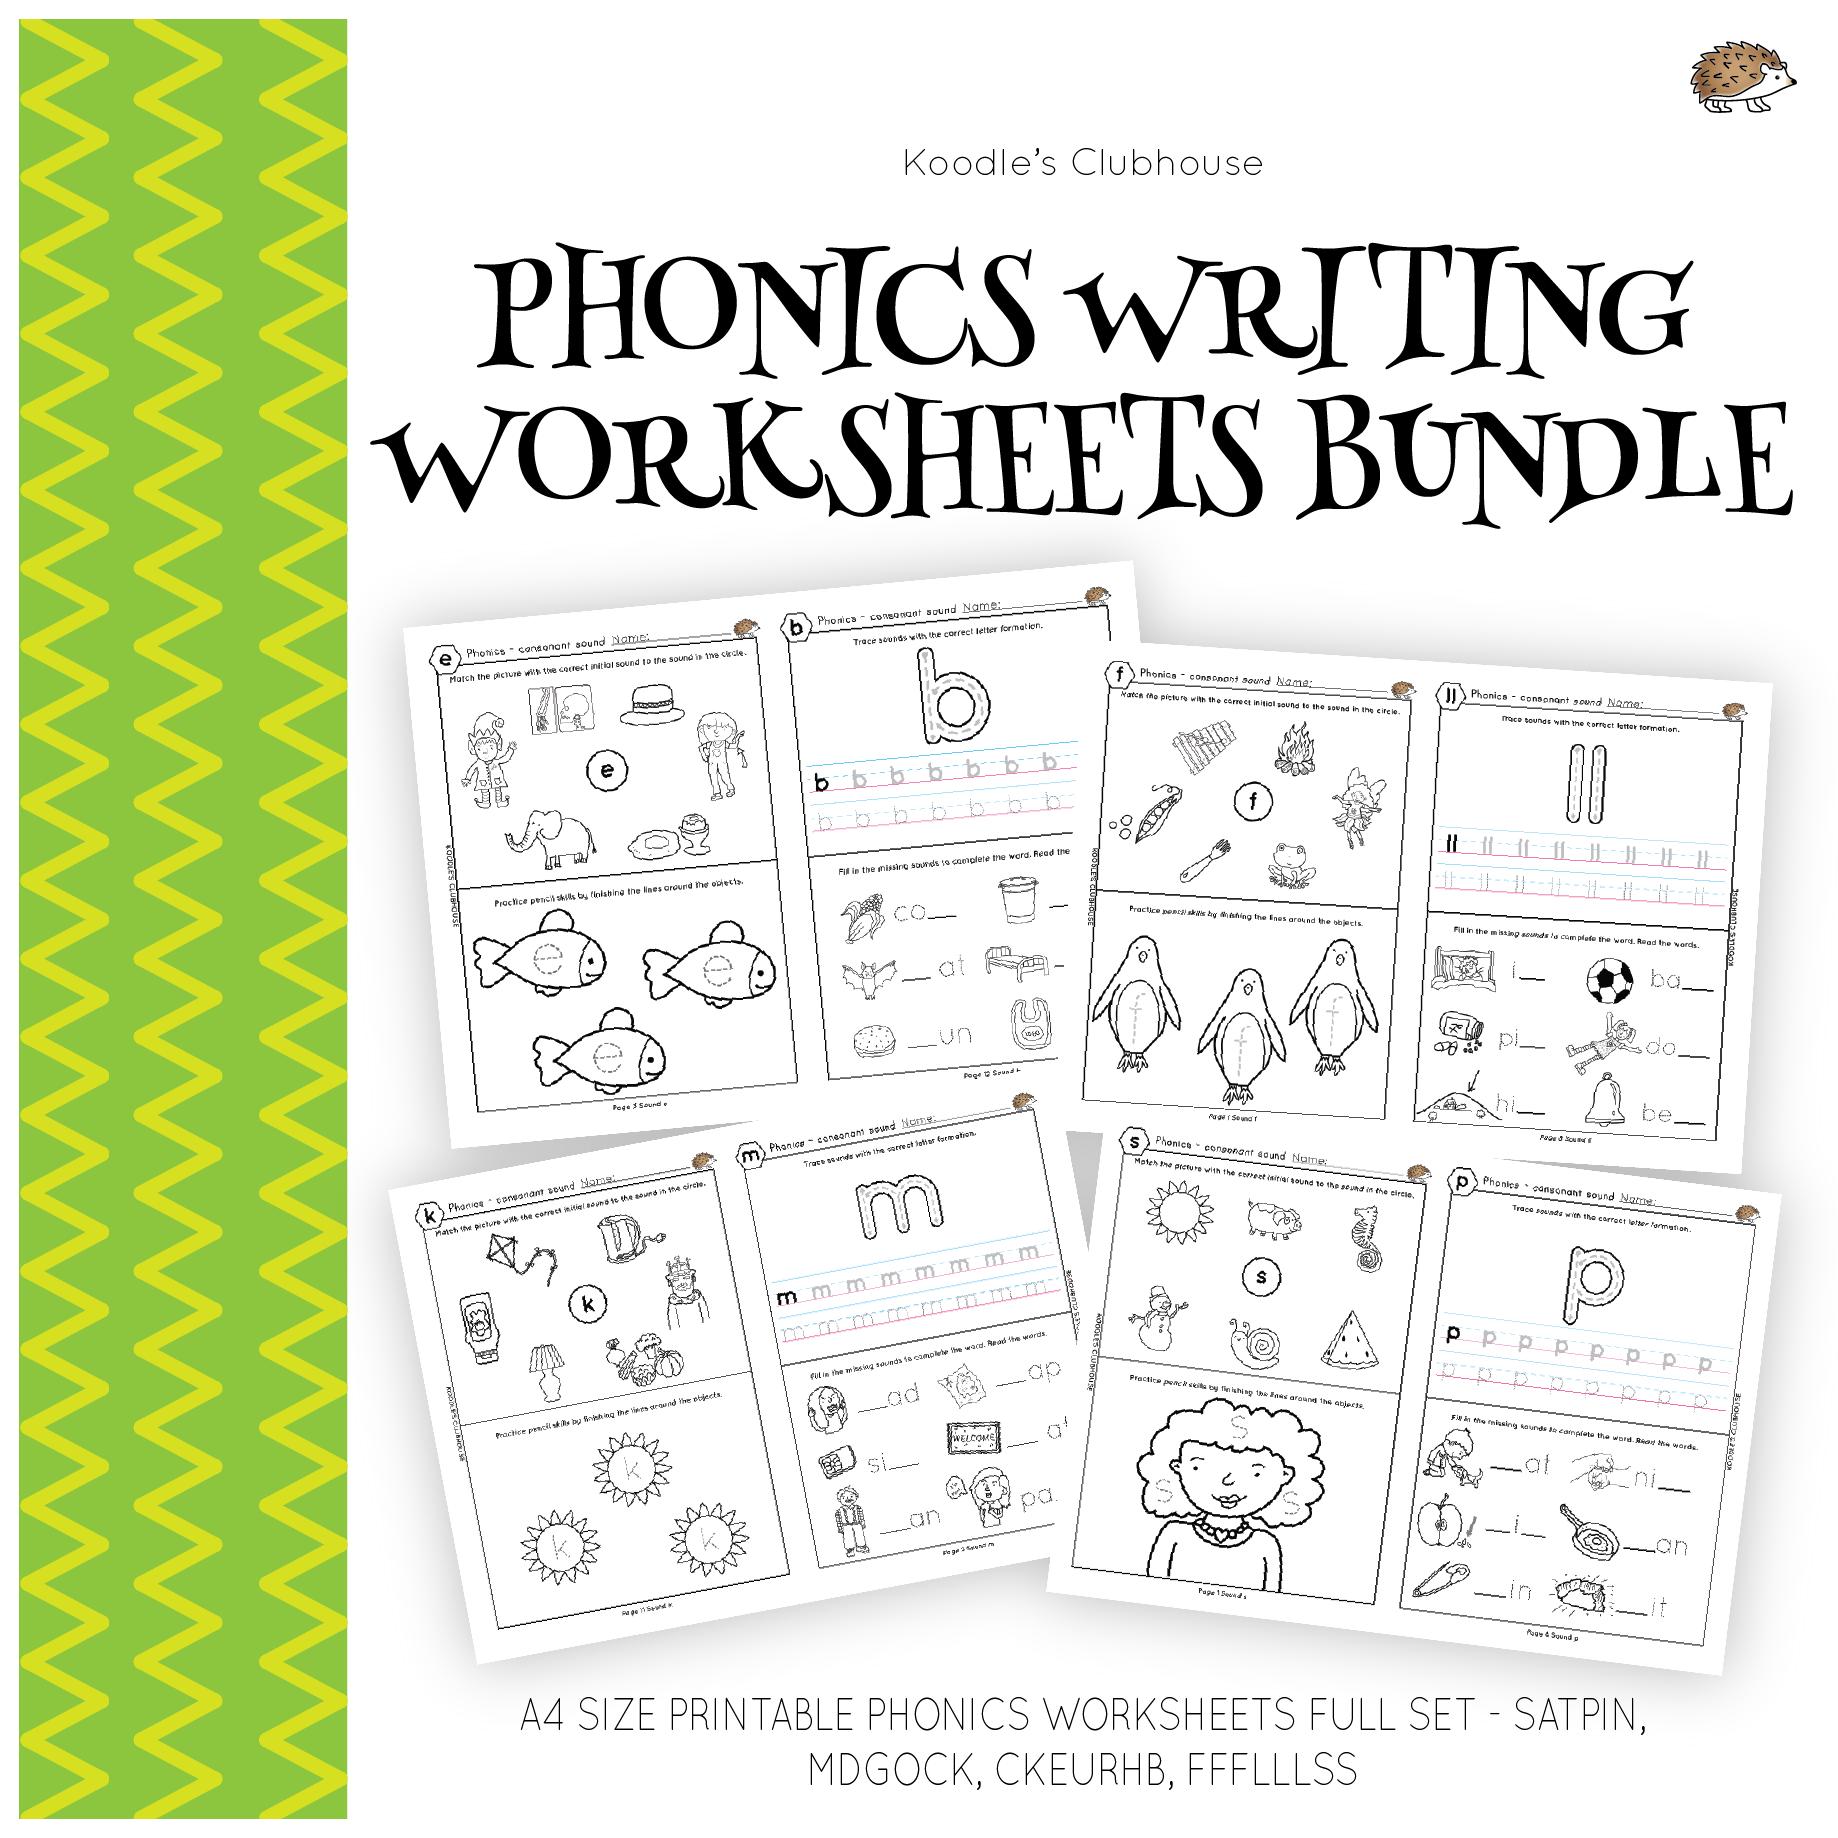 Phonics For Beginner S Worksheets Bundle From Koodle S